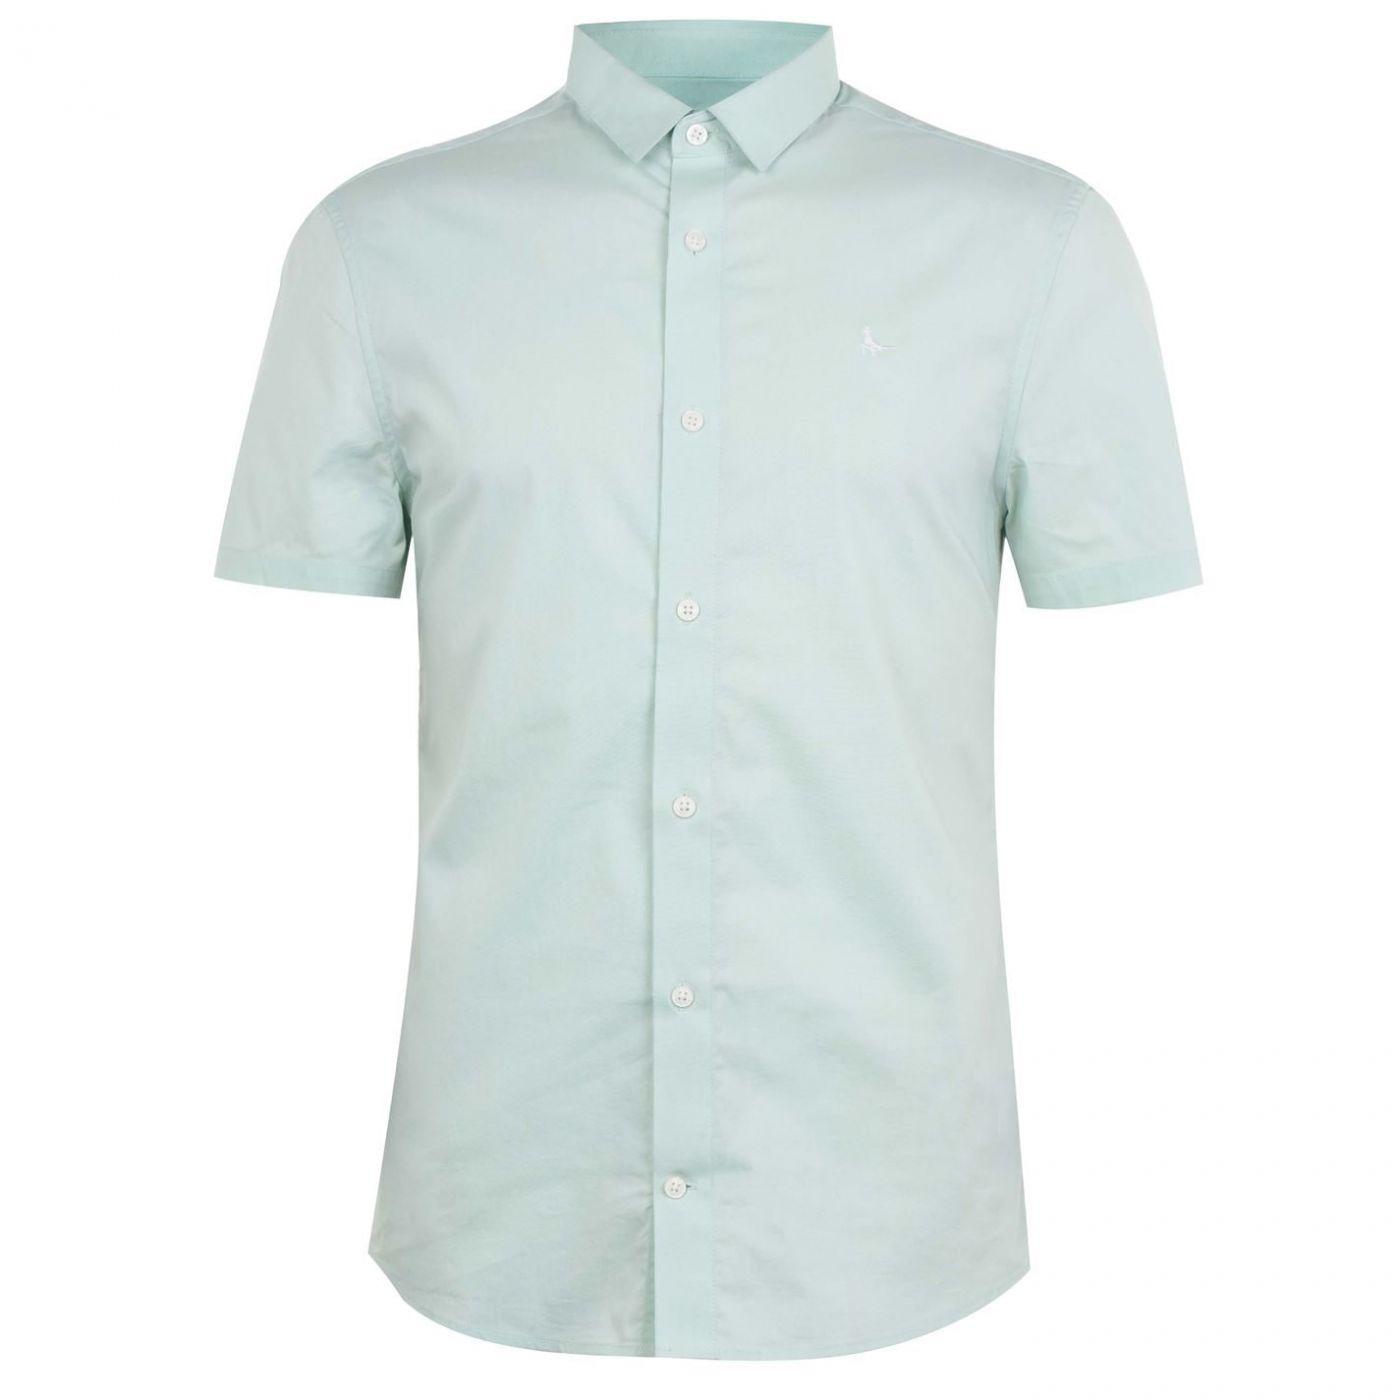 Jack Wills Tencreek Short Sleeved Shirt